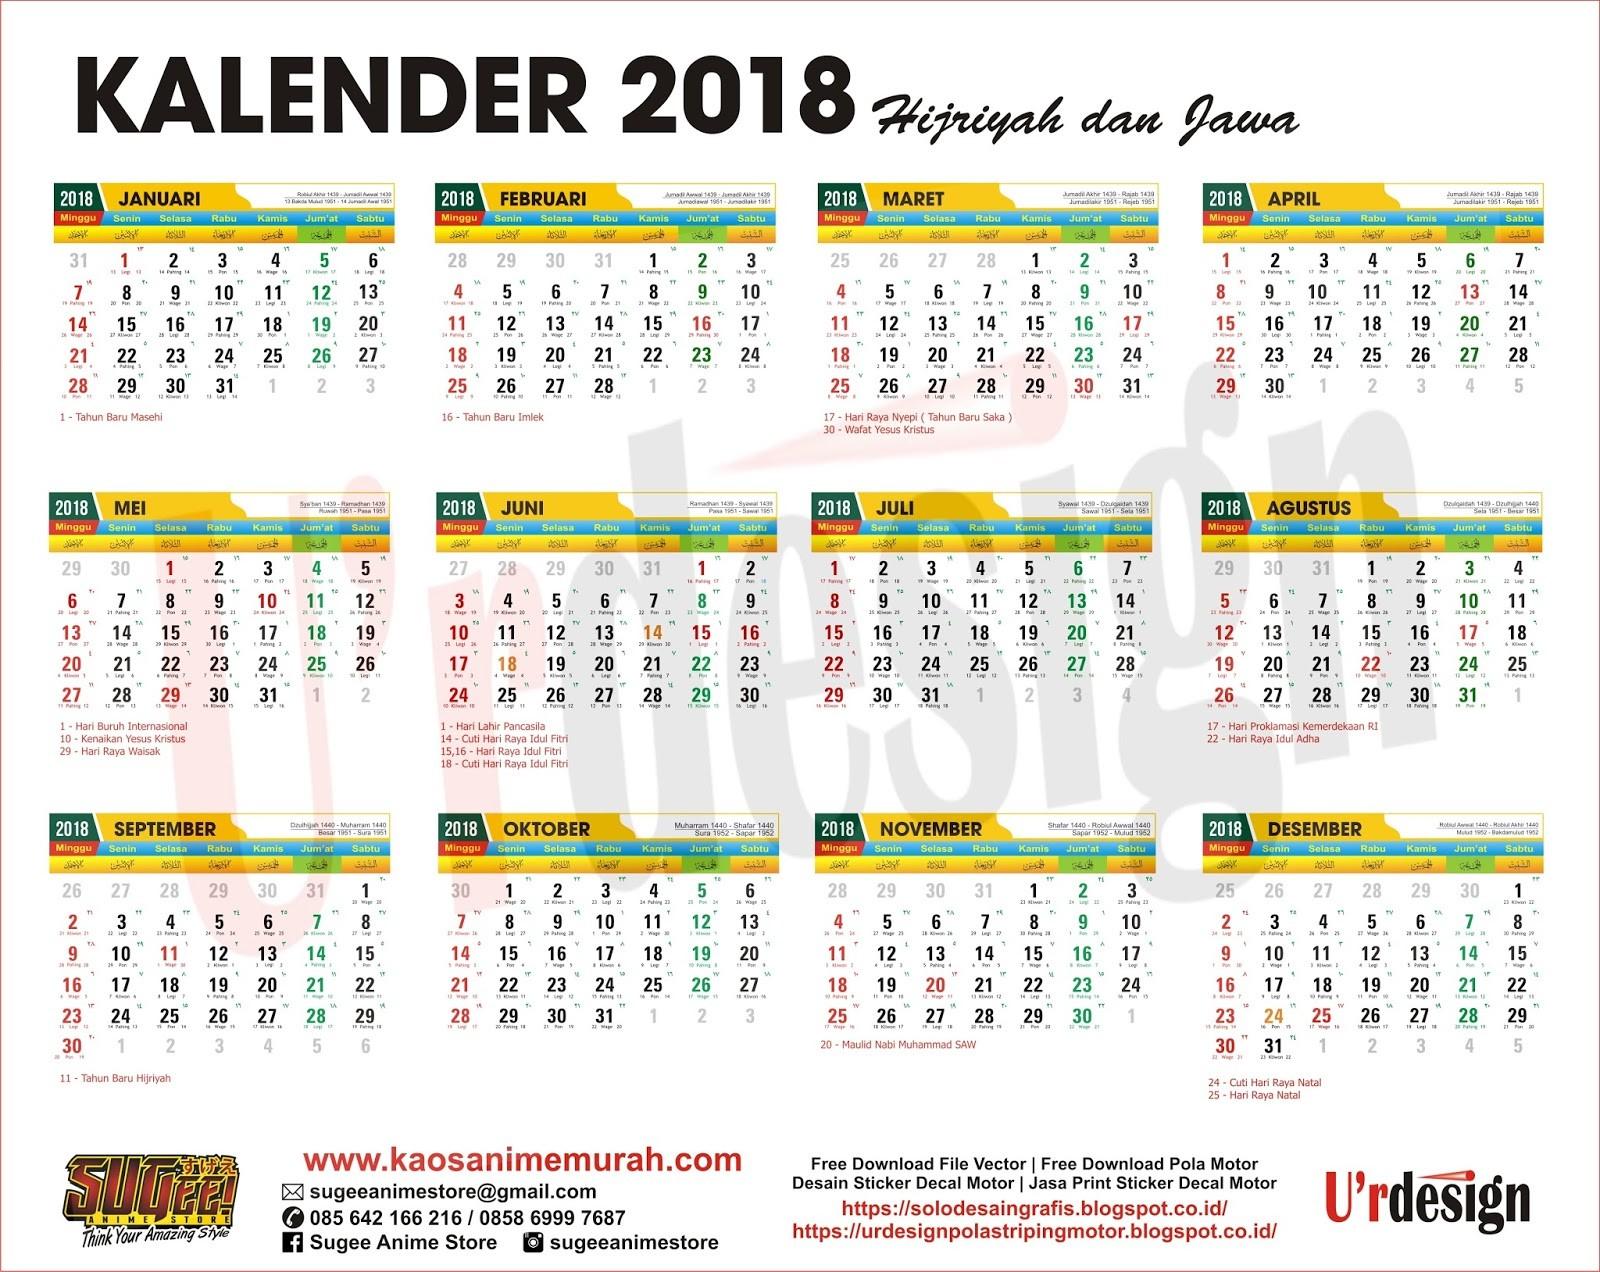 Kalender 2018 lengkap